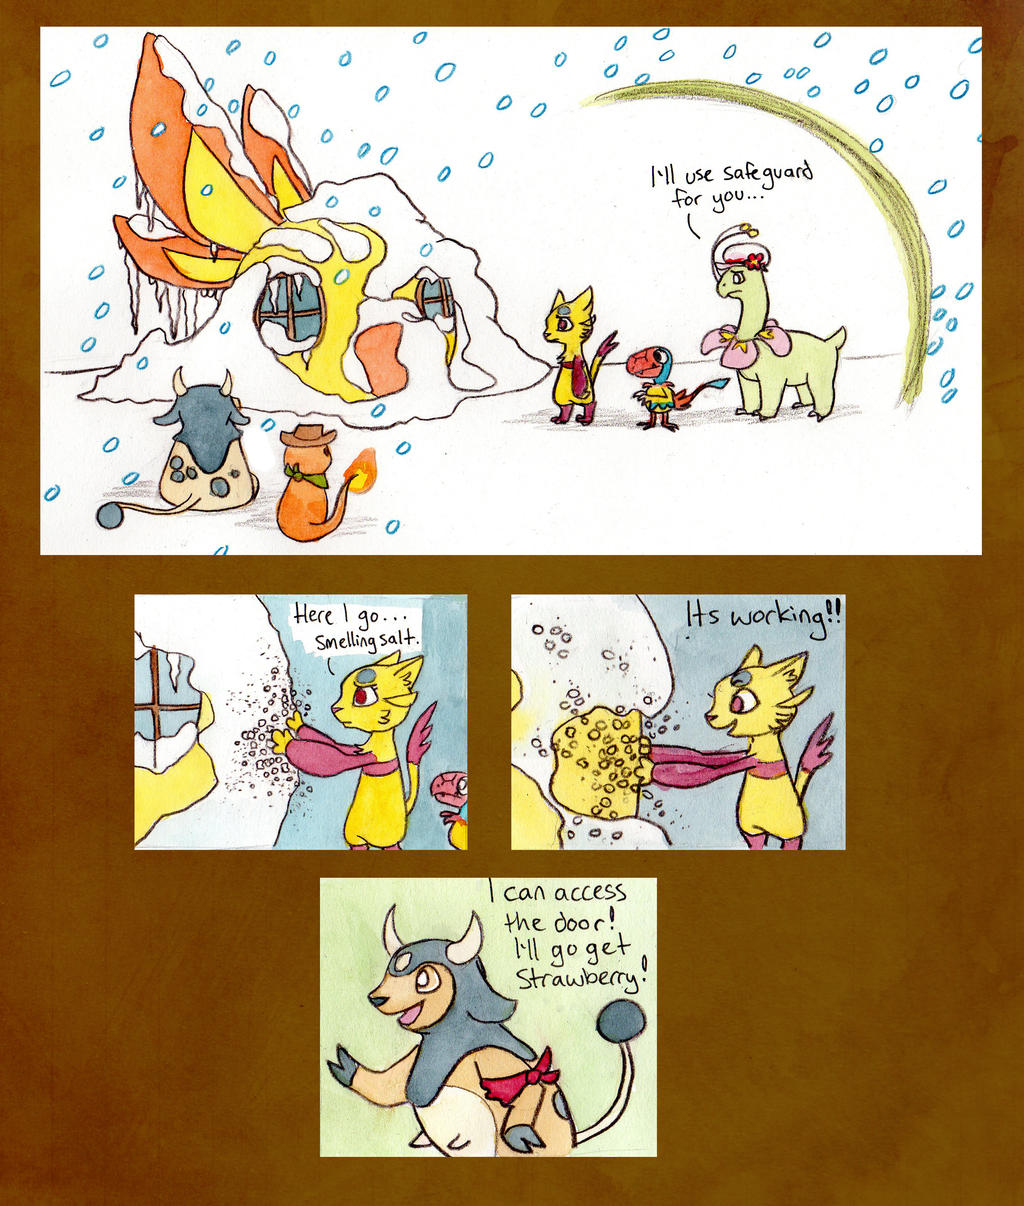 Mission 5: Page 8, Team BHTB by owlburrow